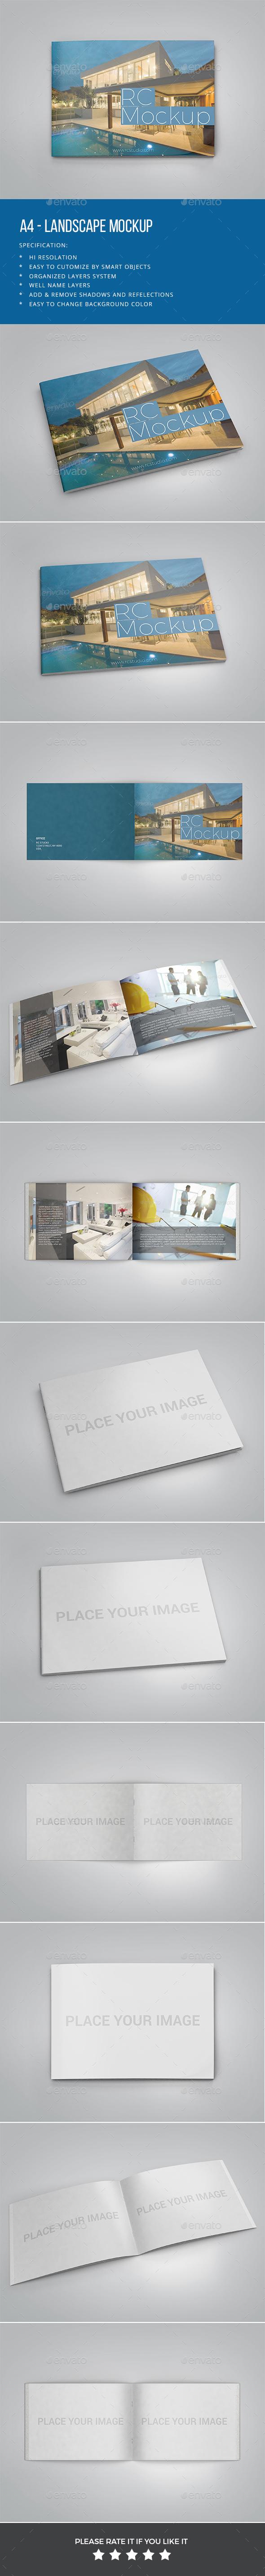 A4- Landscape Mockup - Print Product Mock-Ups